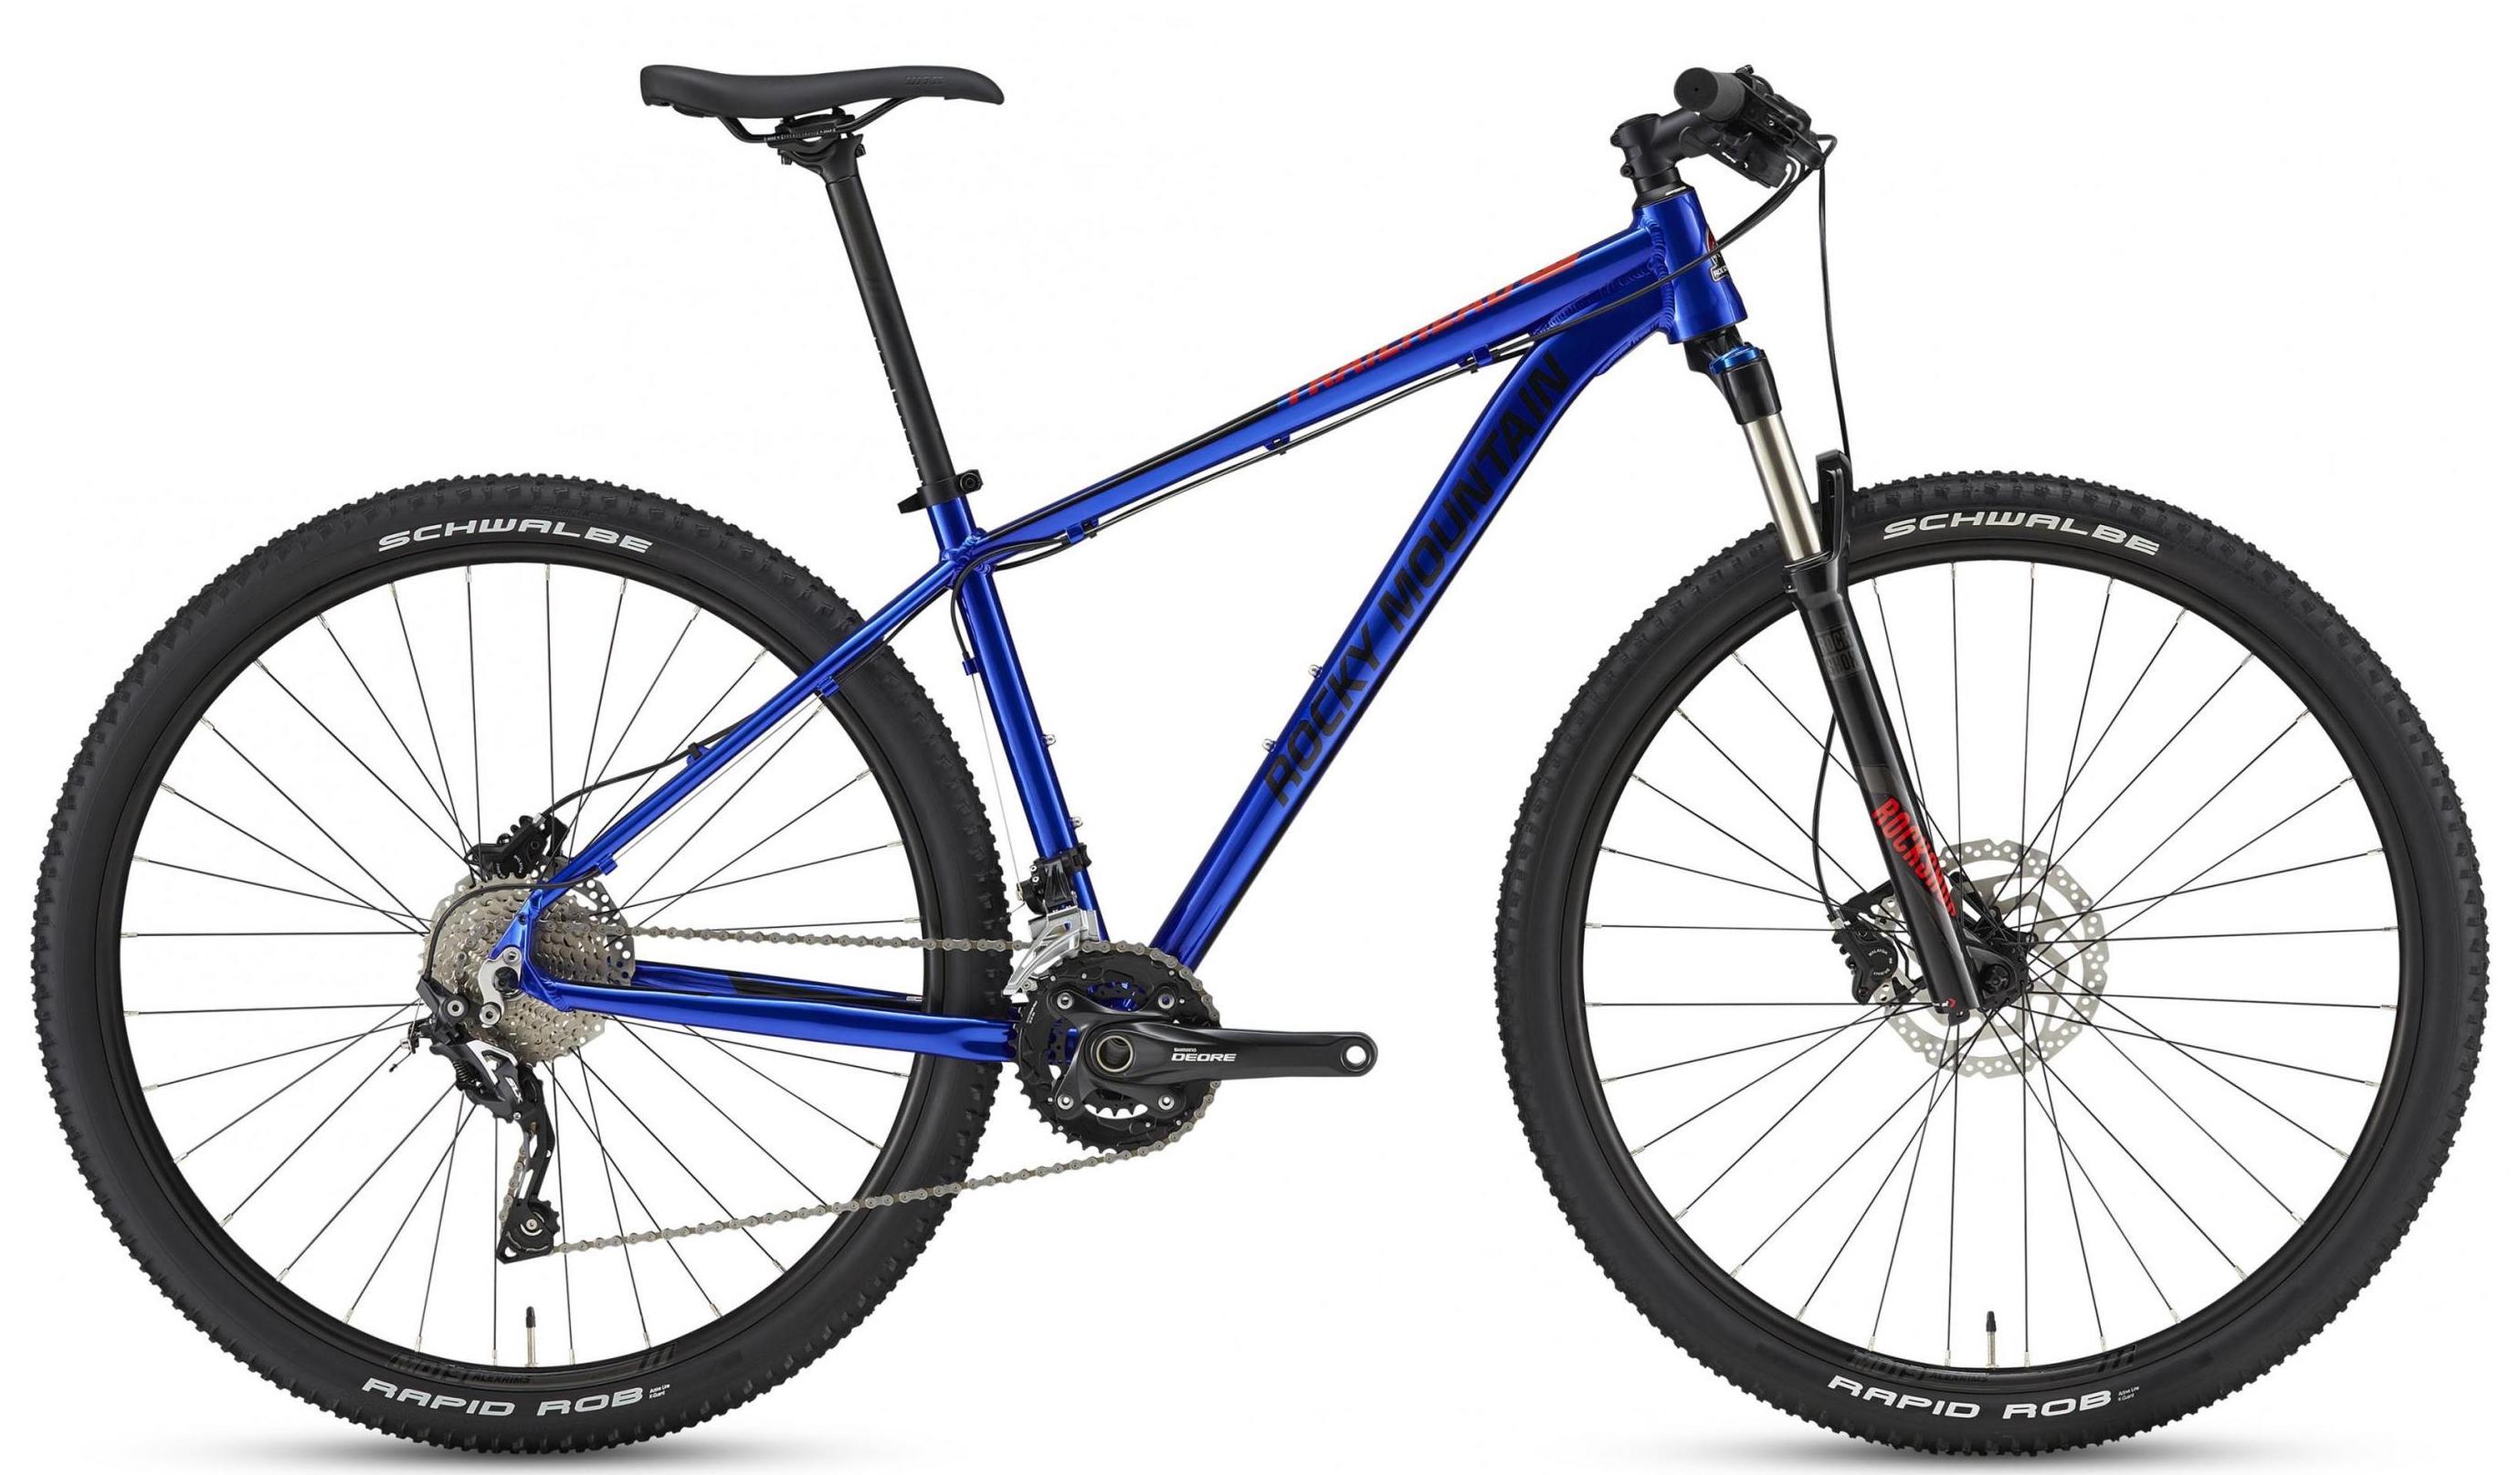 Велосипед ROCKY MOUNTAIN Trailhead 40 2018, Велосипеды - арт. 1032010390